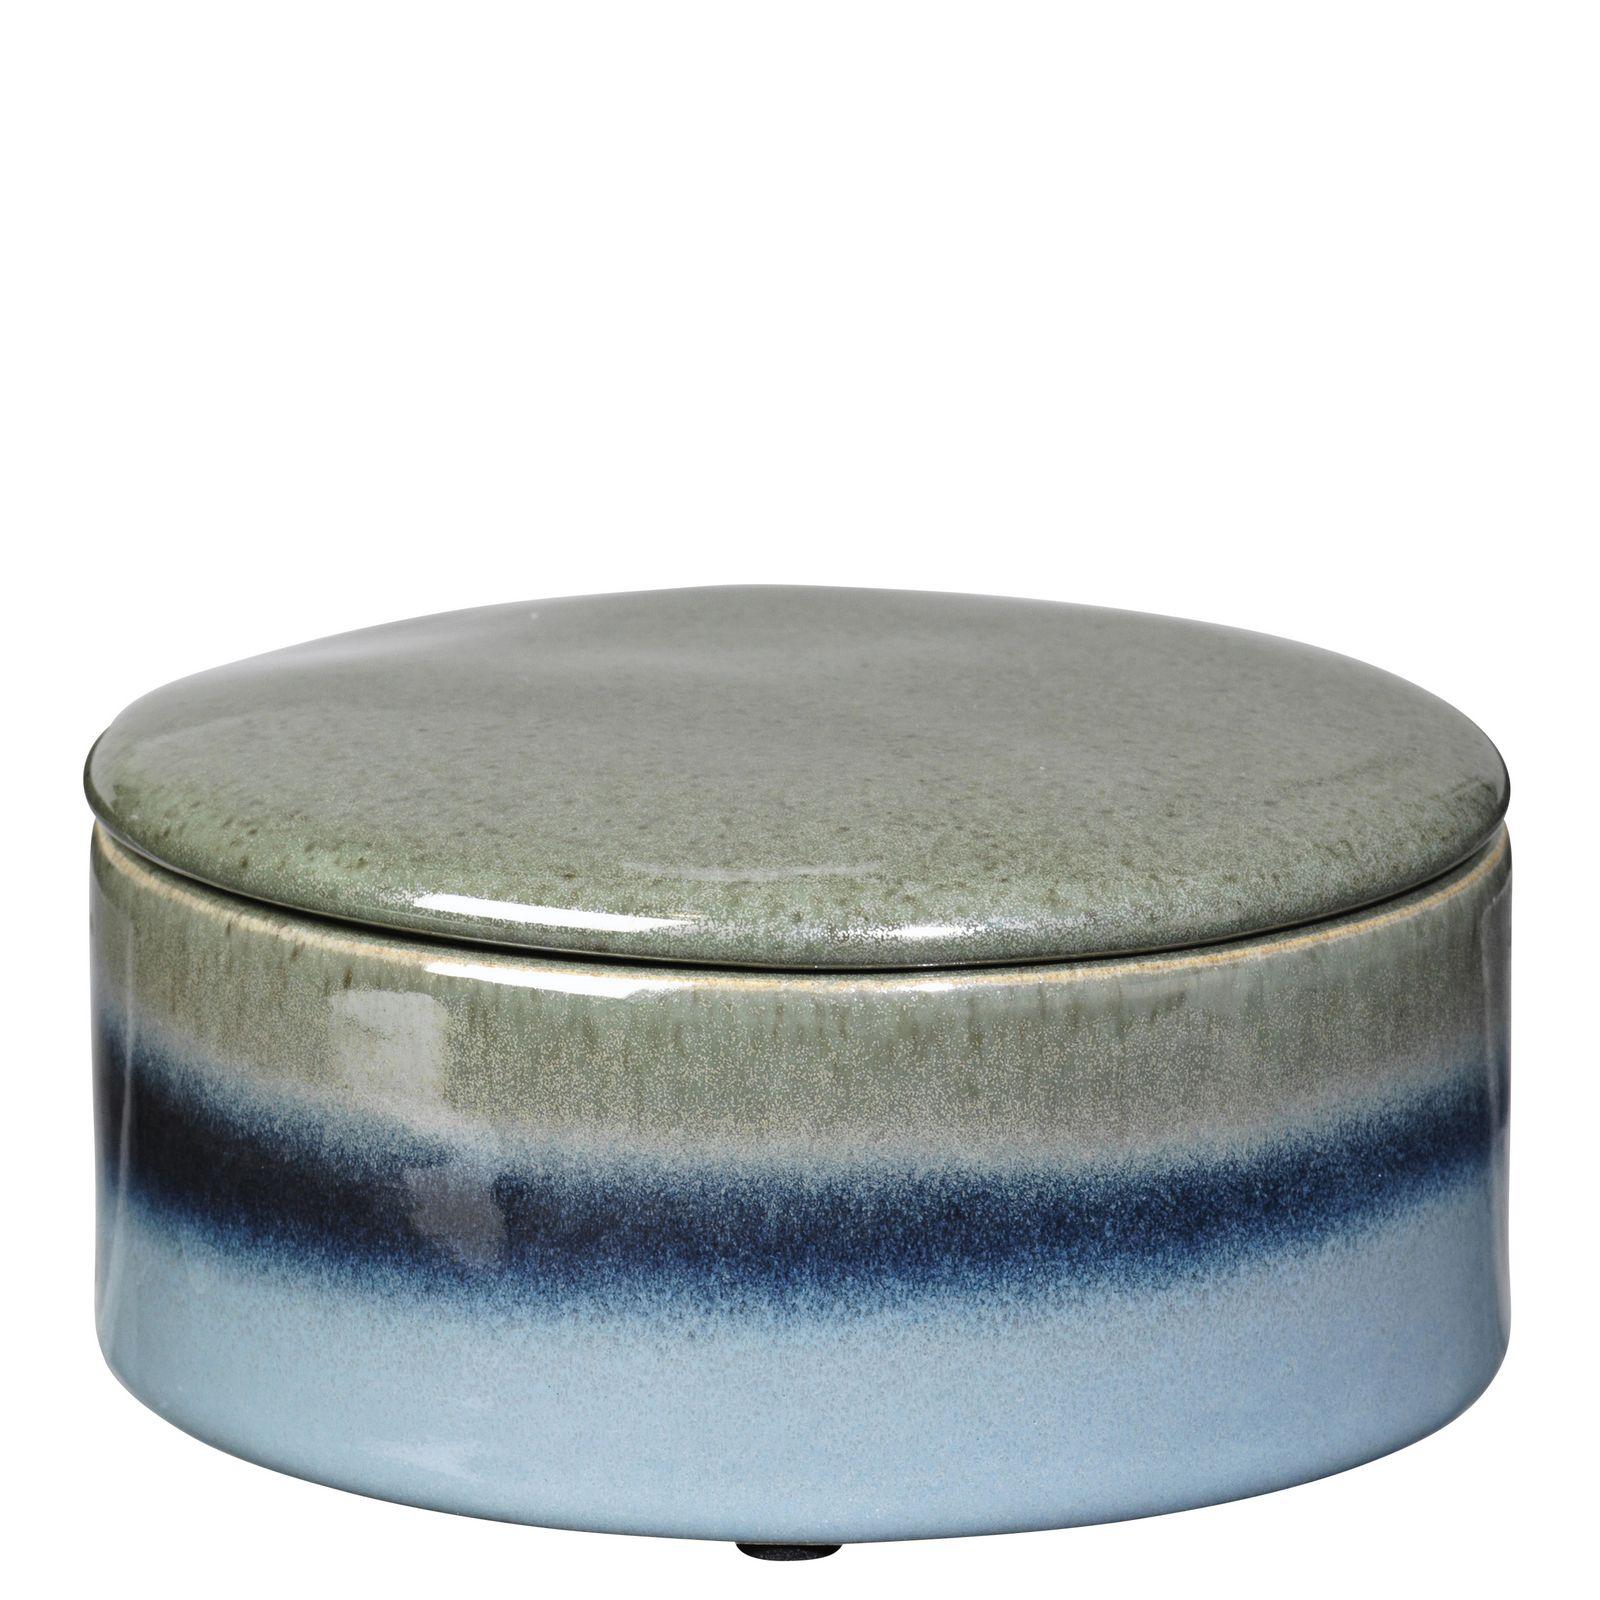 цены Шкатулка Broste Carol, цвет: голубой, 14х14х7 см. 14463124